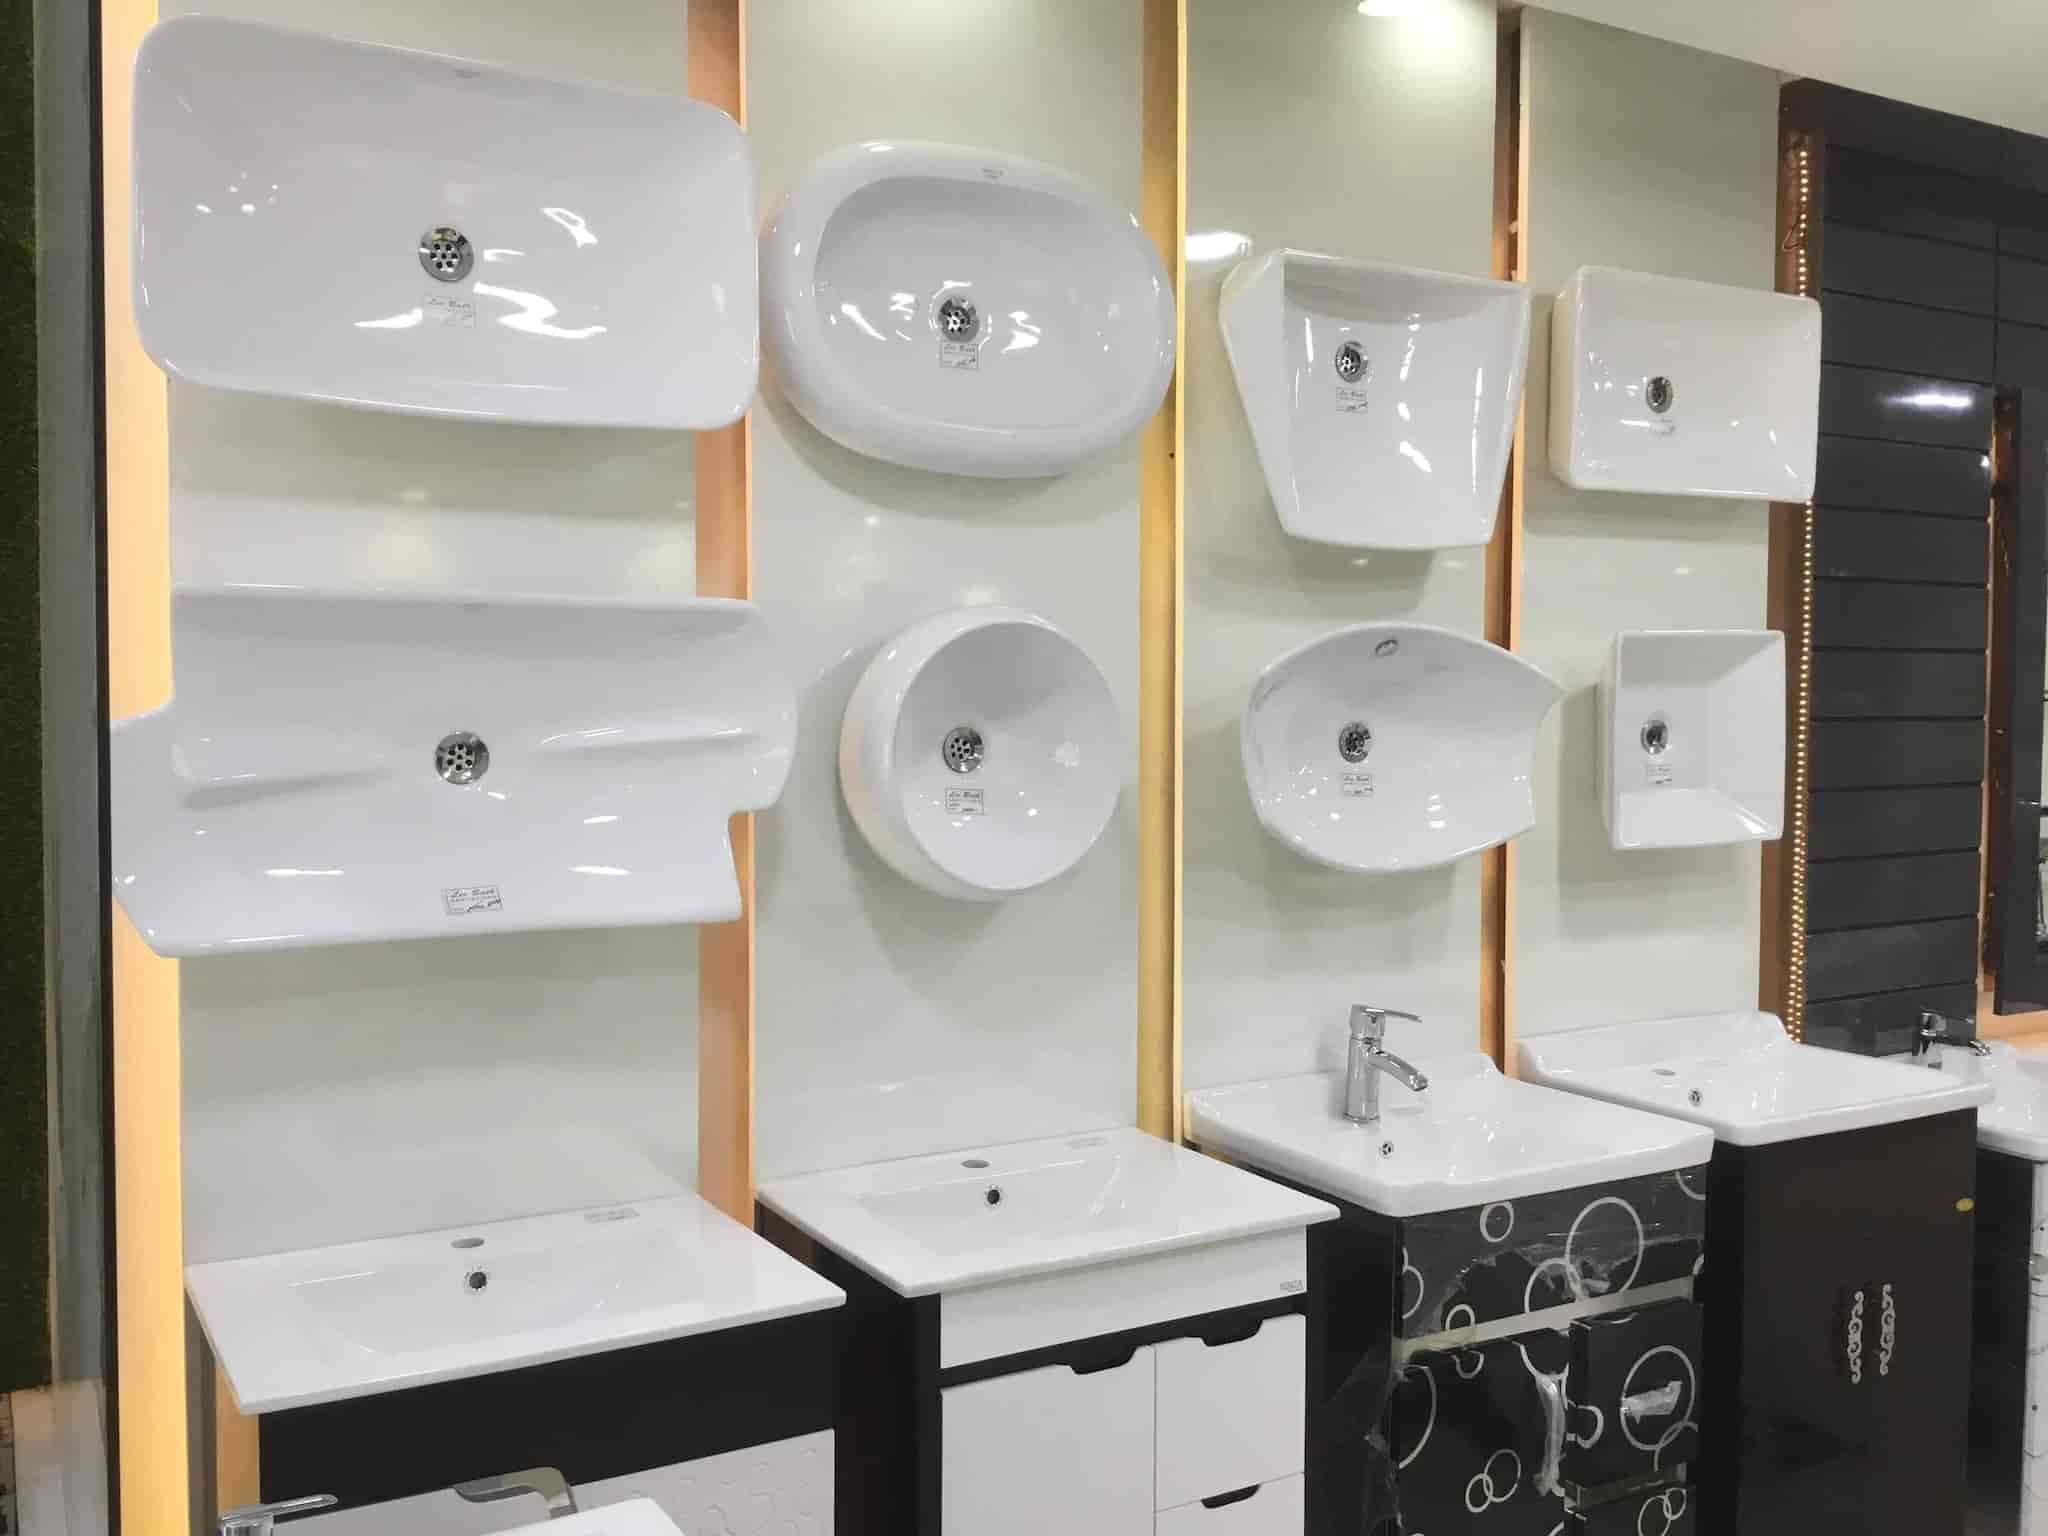 Charmant ... Lee Bath Sanitation Photos, Dugri Road, Ludhiana   Tile Adhesive Dealers  ...